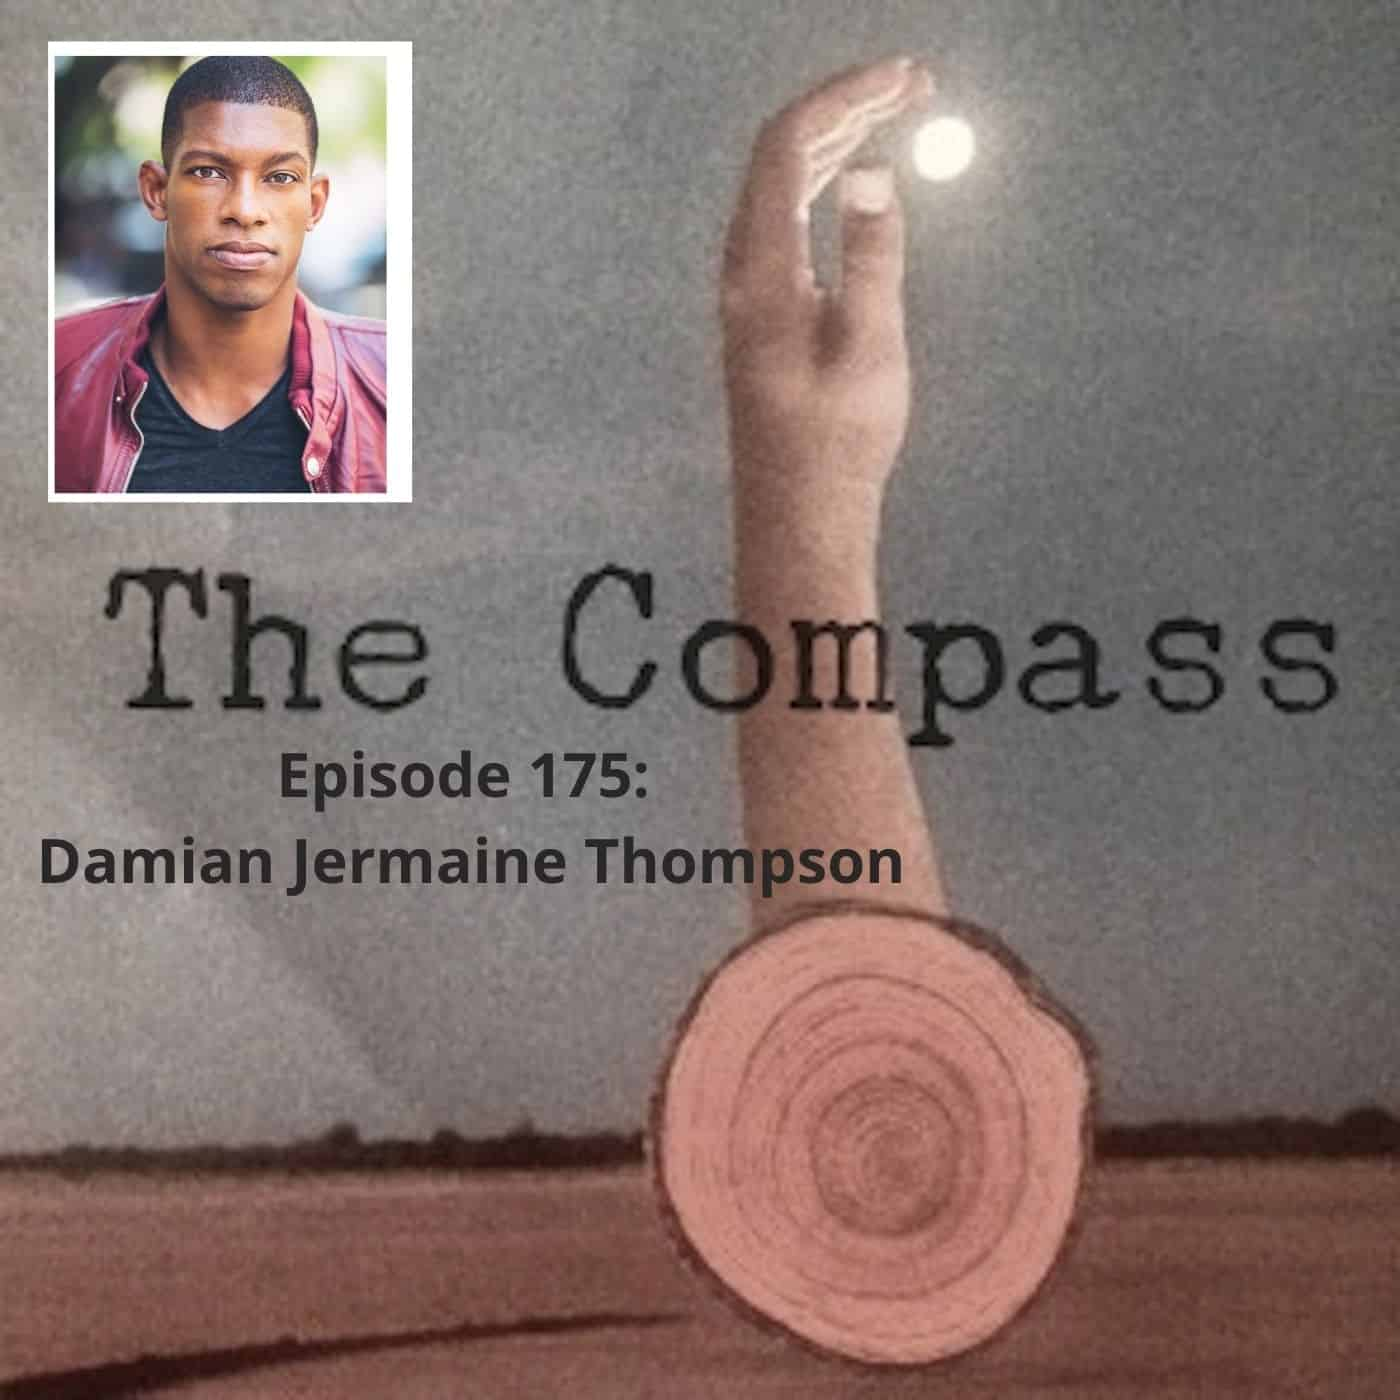 Episode 175: Damian Jermaine Thompson